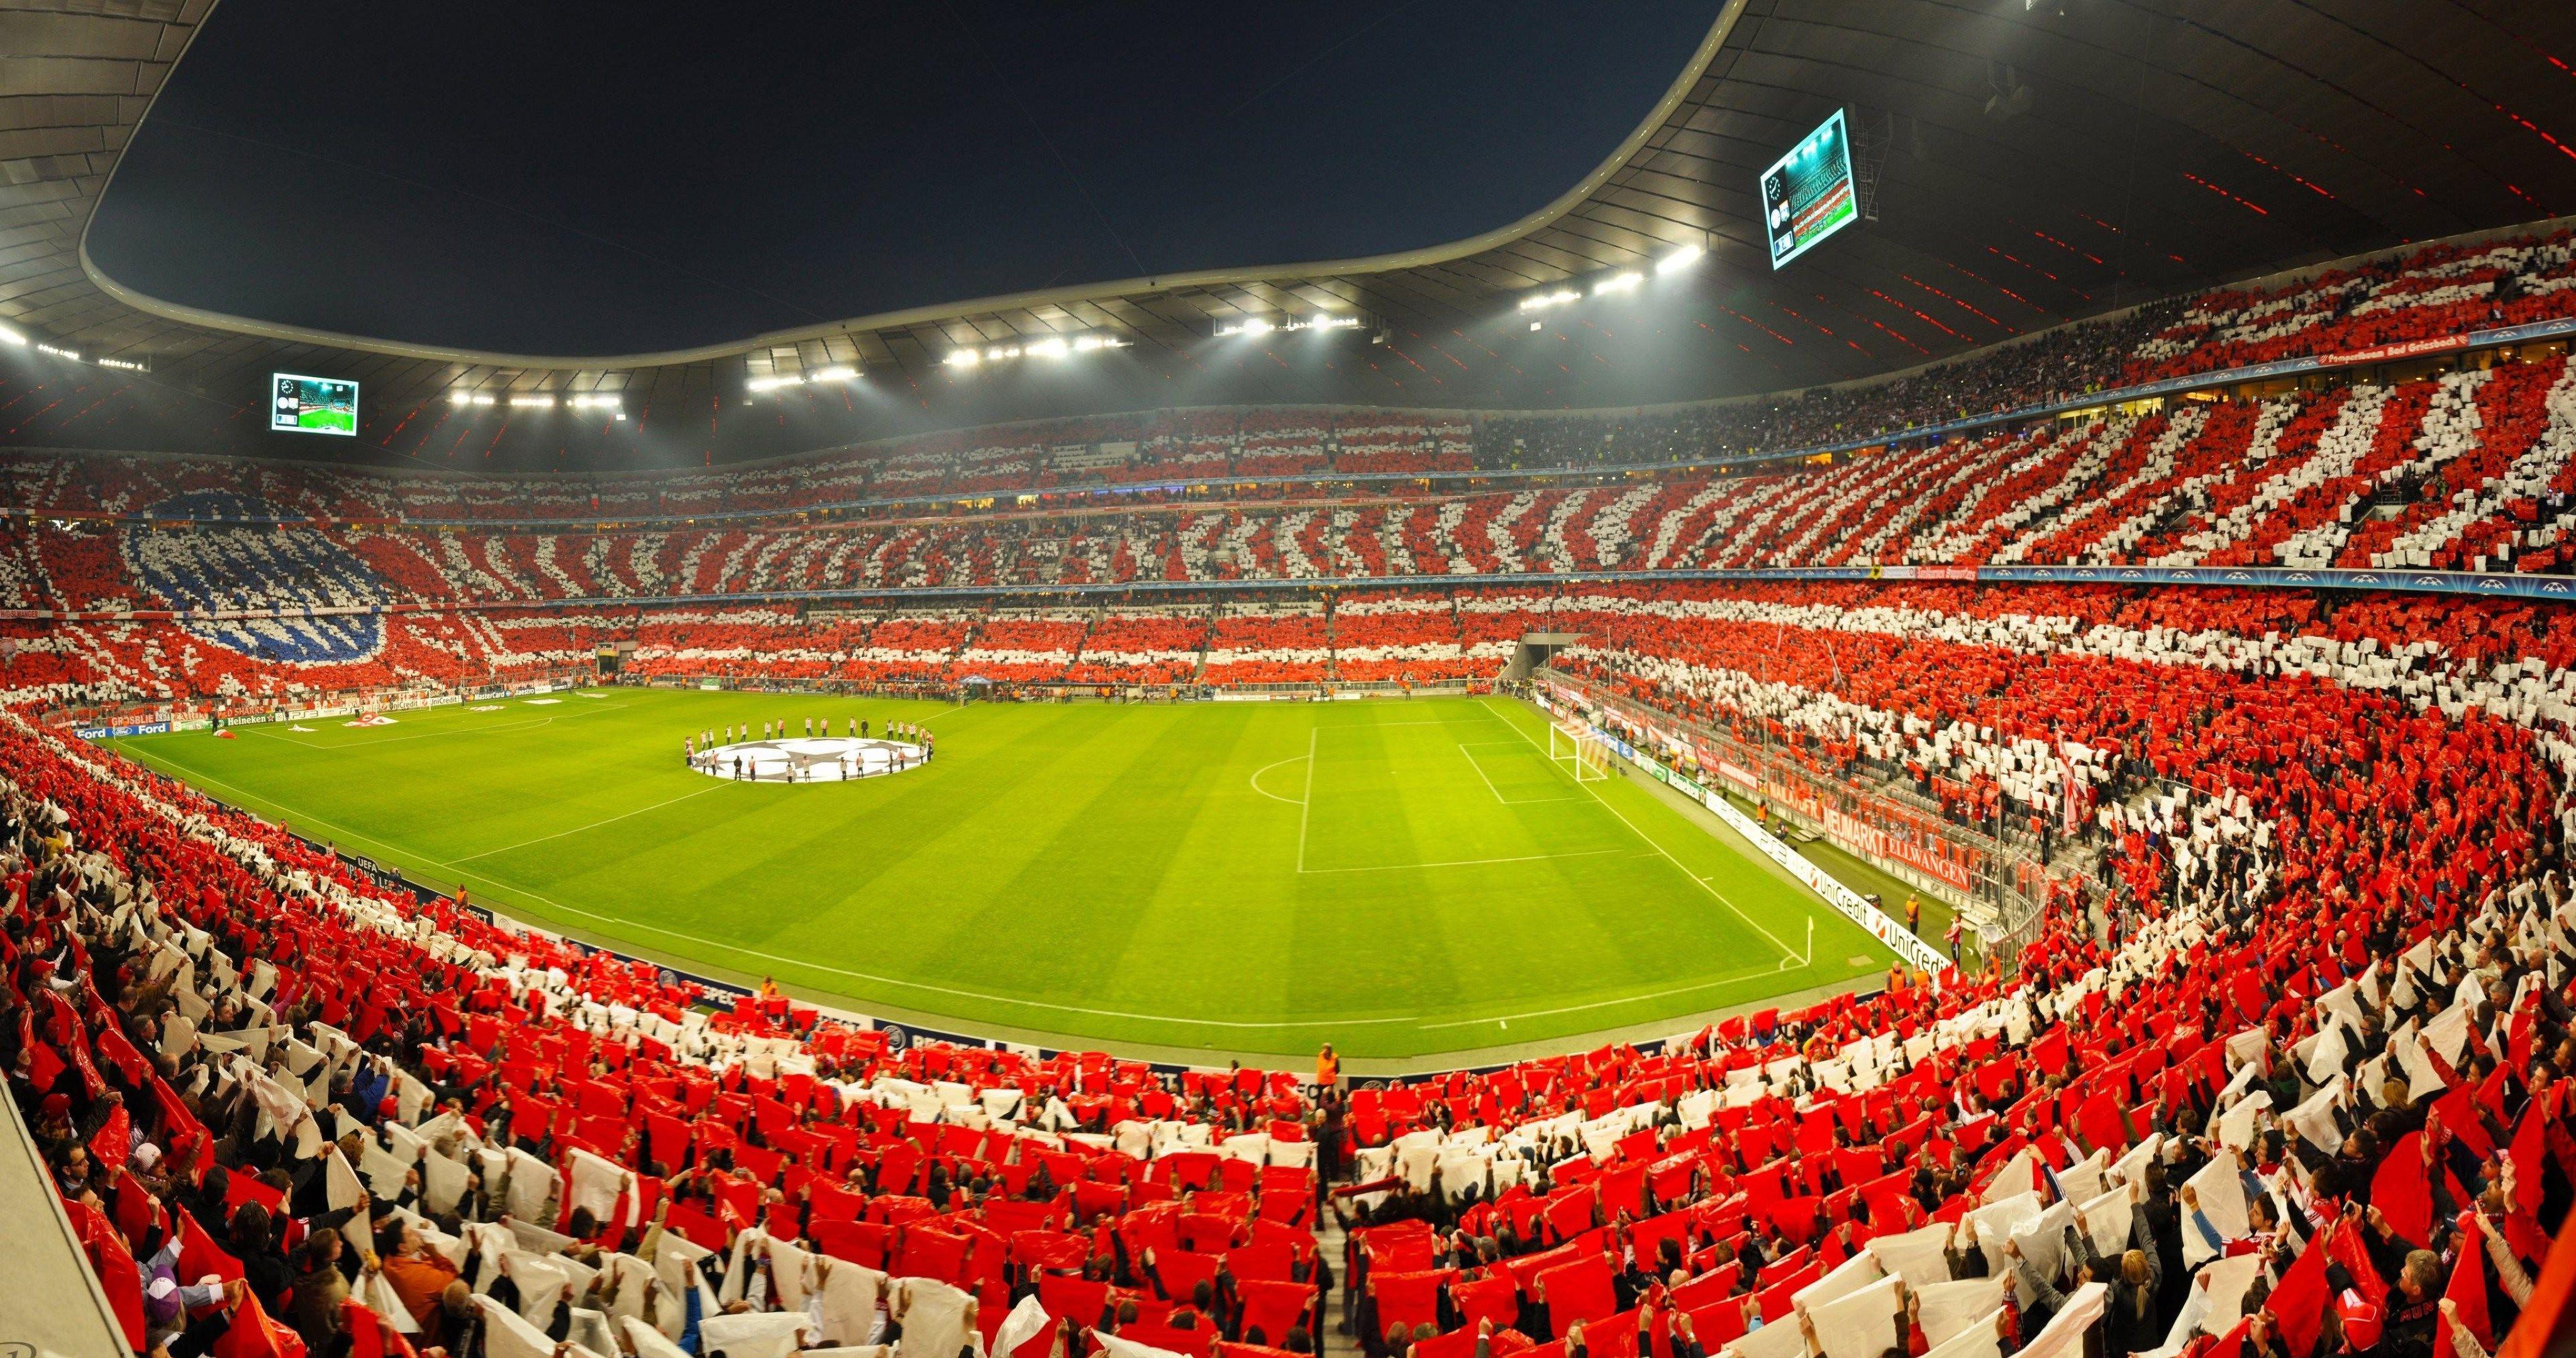 Fondos De Pantalla 4k Ultra Hd Soccer Los Mejores Fondos 4k Ultra Hd De Futbol Gratis Wallpaperaccess In 2020 Bayern Munich Bayern Bayern Munich Wallpapers